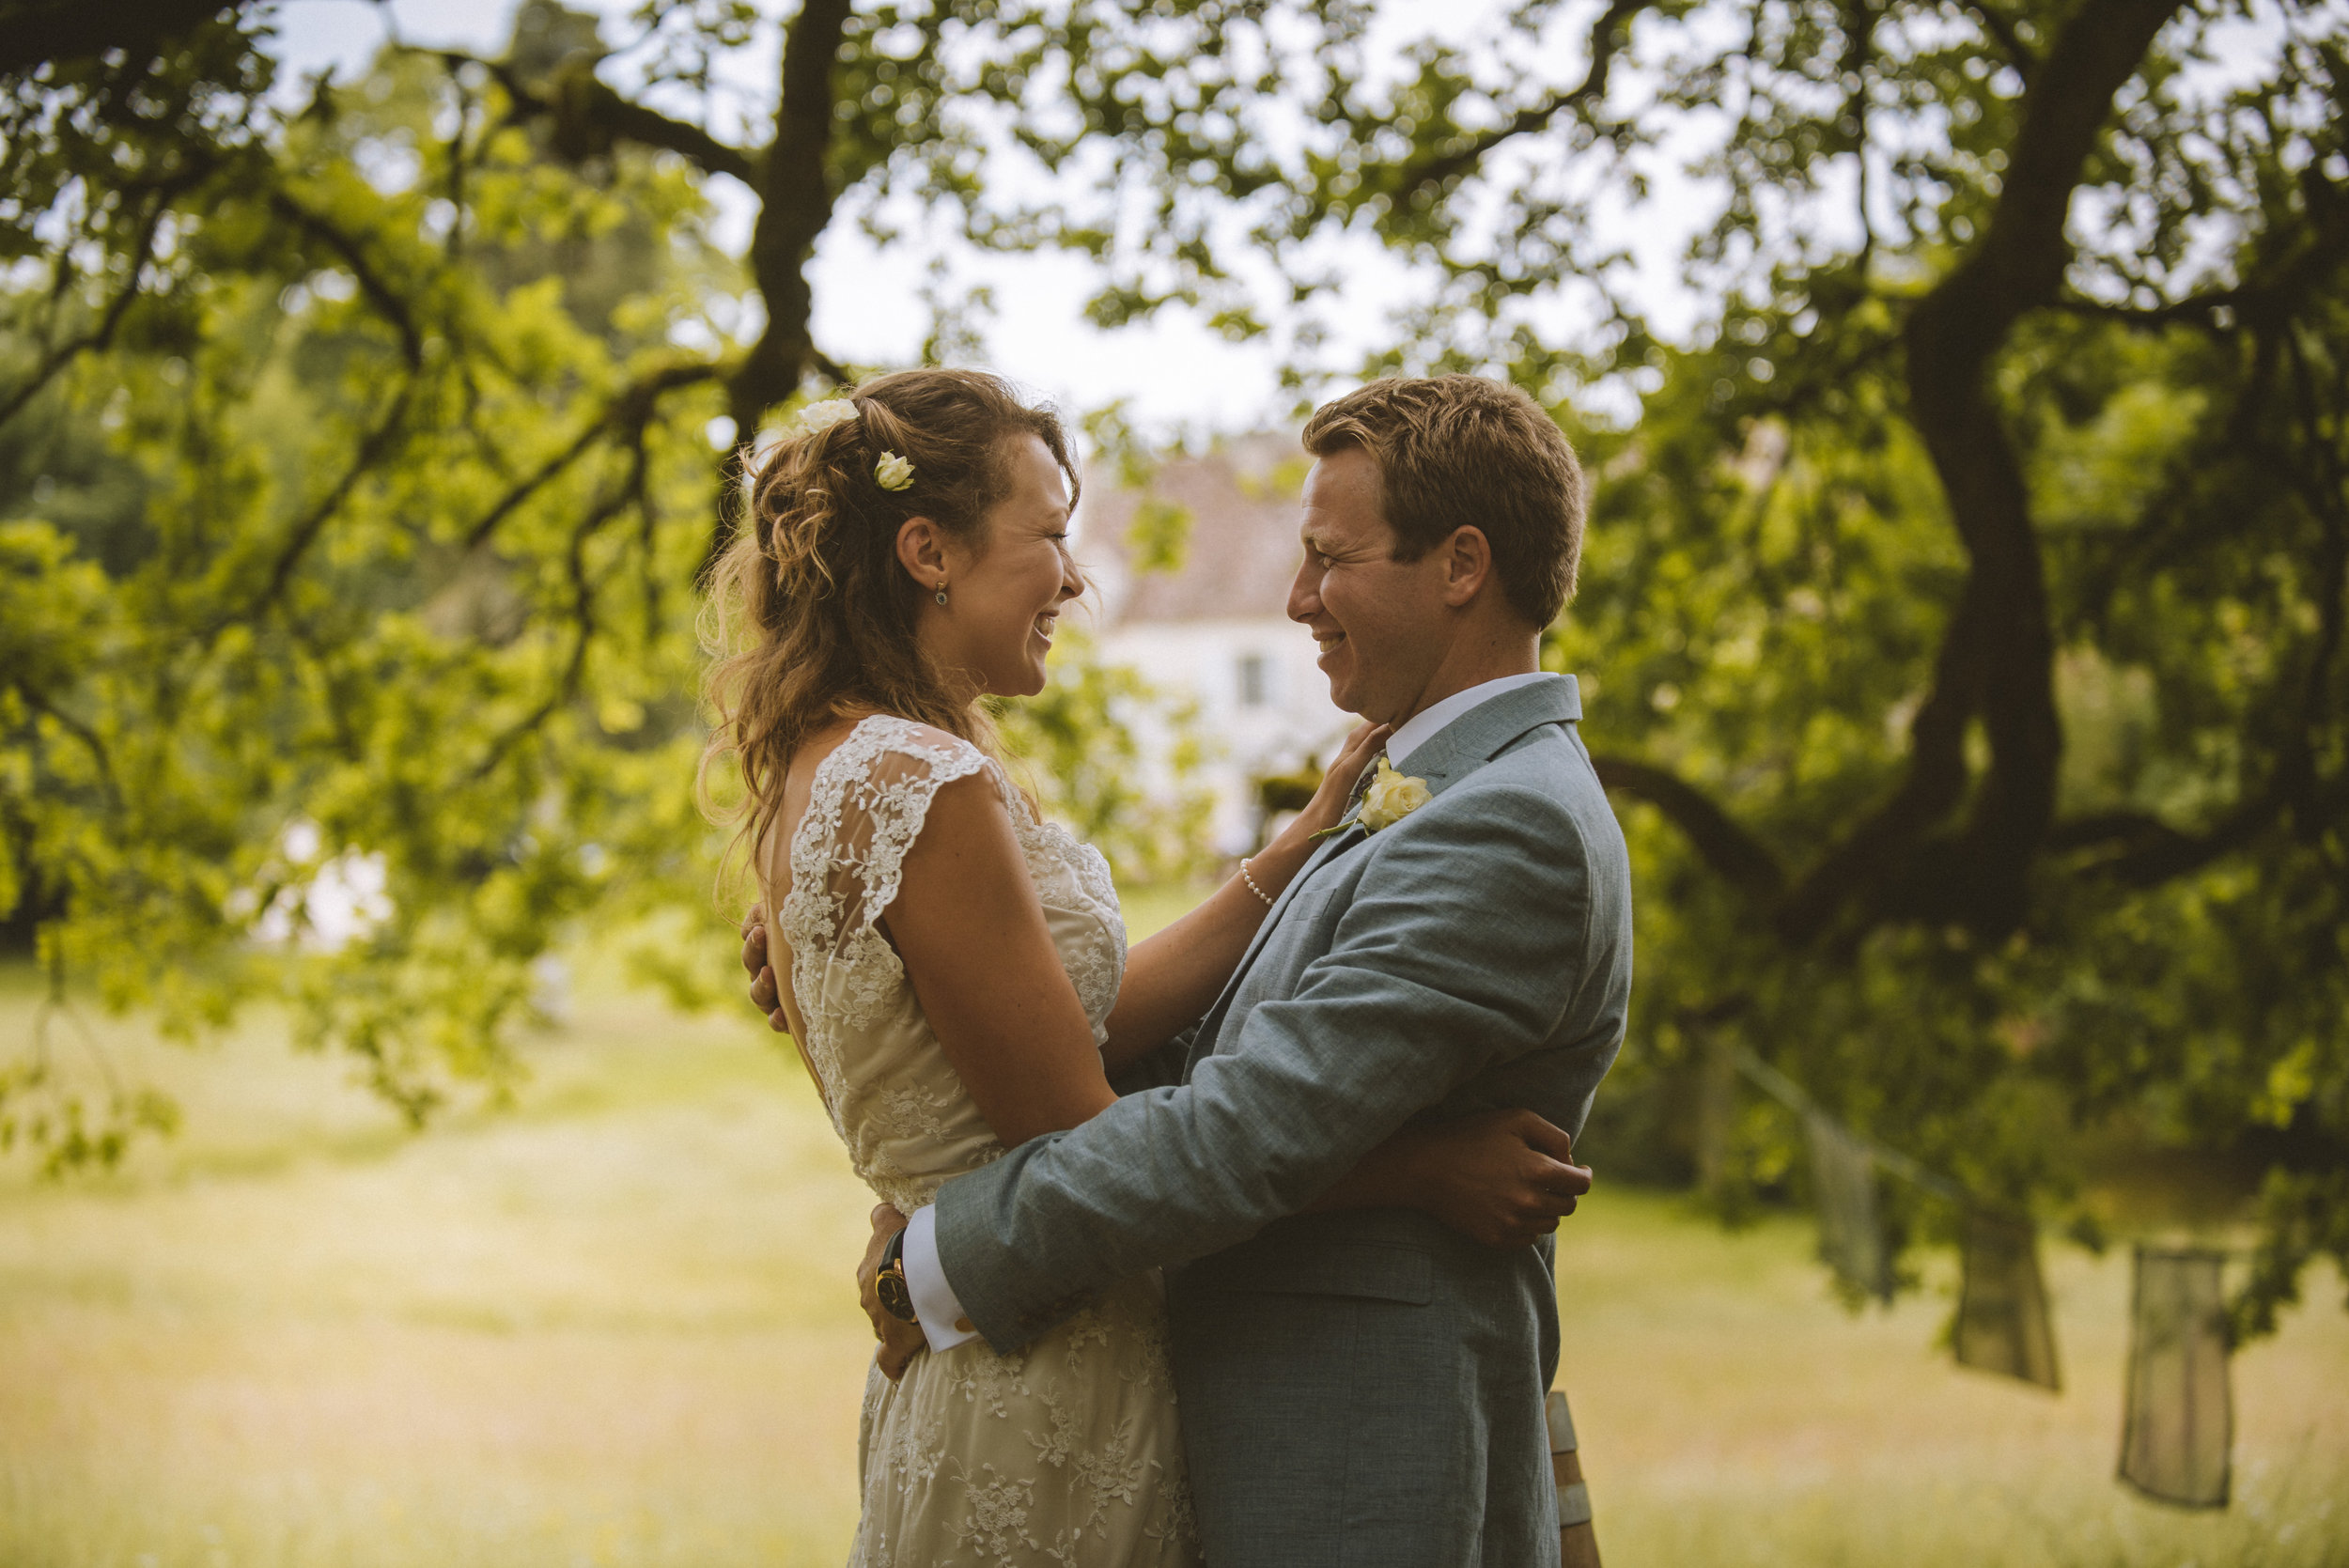 dordogne-wedding-photographer-mark-shaw-32.jpg